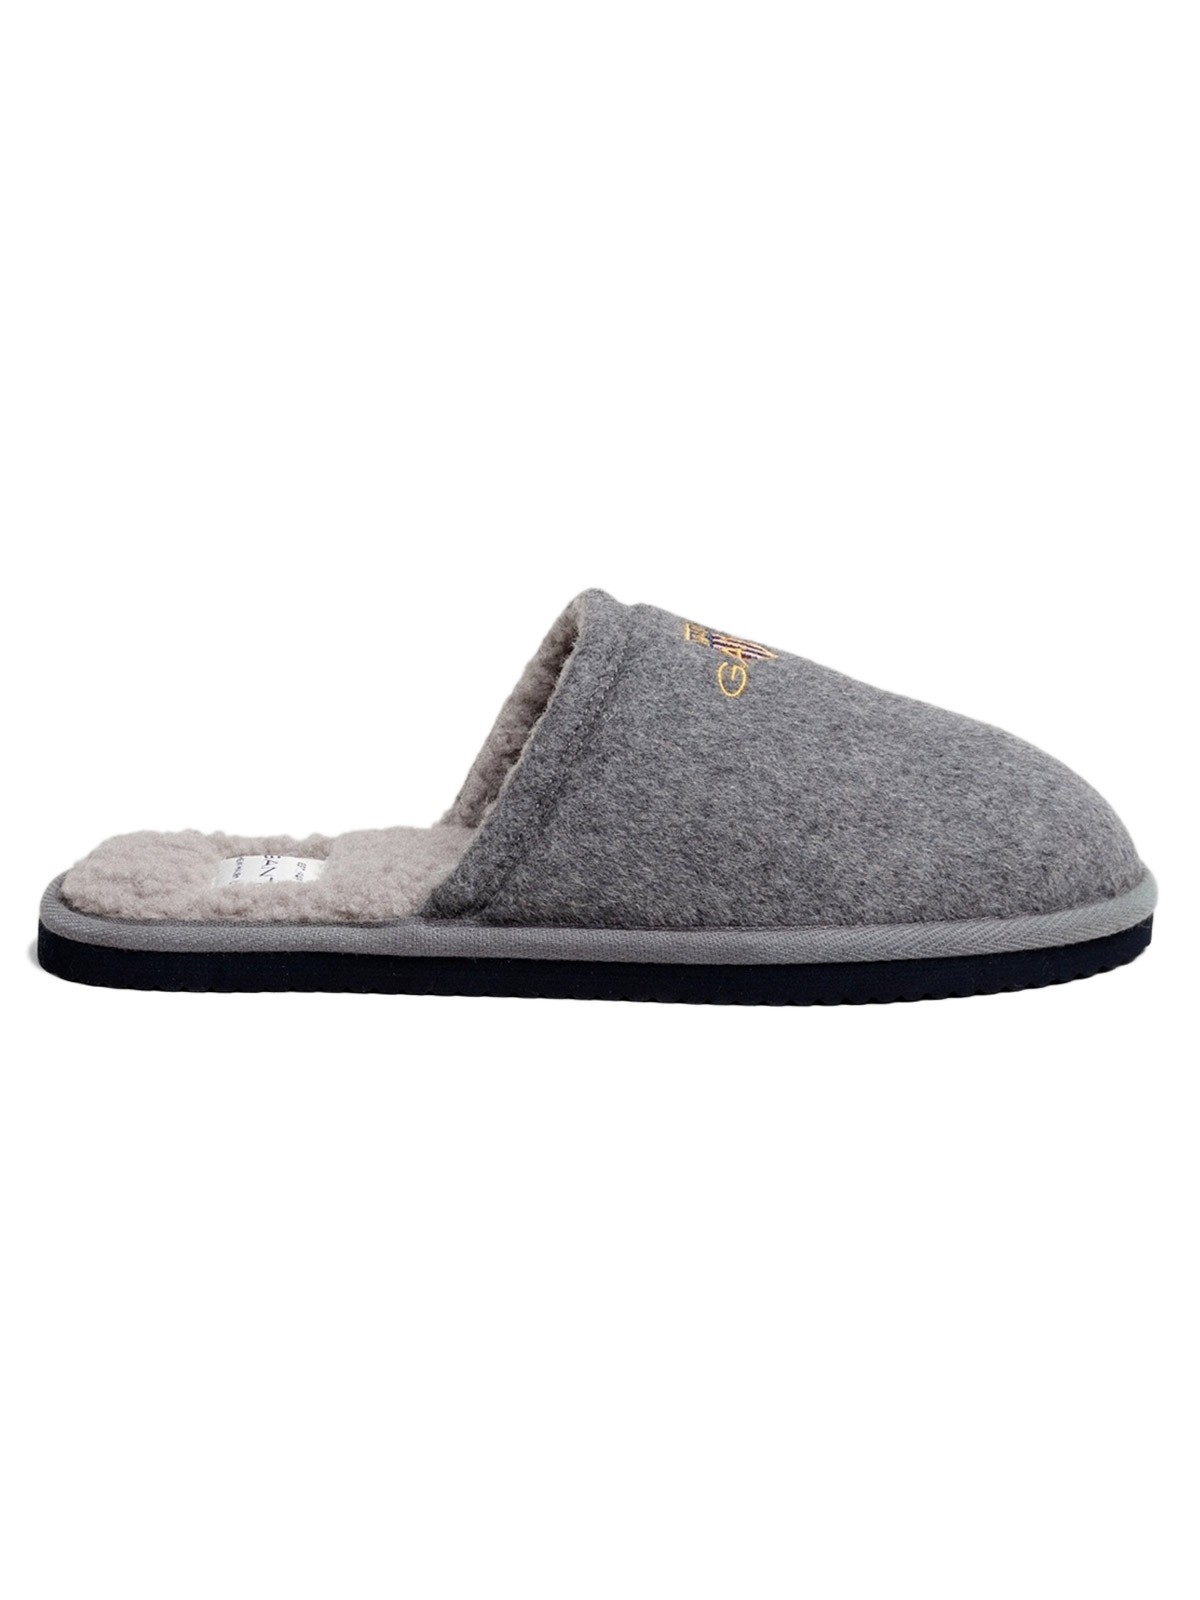 Picture of GANT | Men's Tamaware Slippers